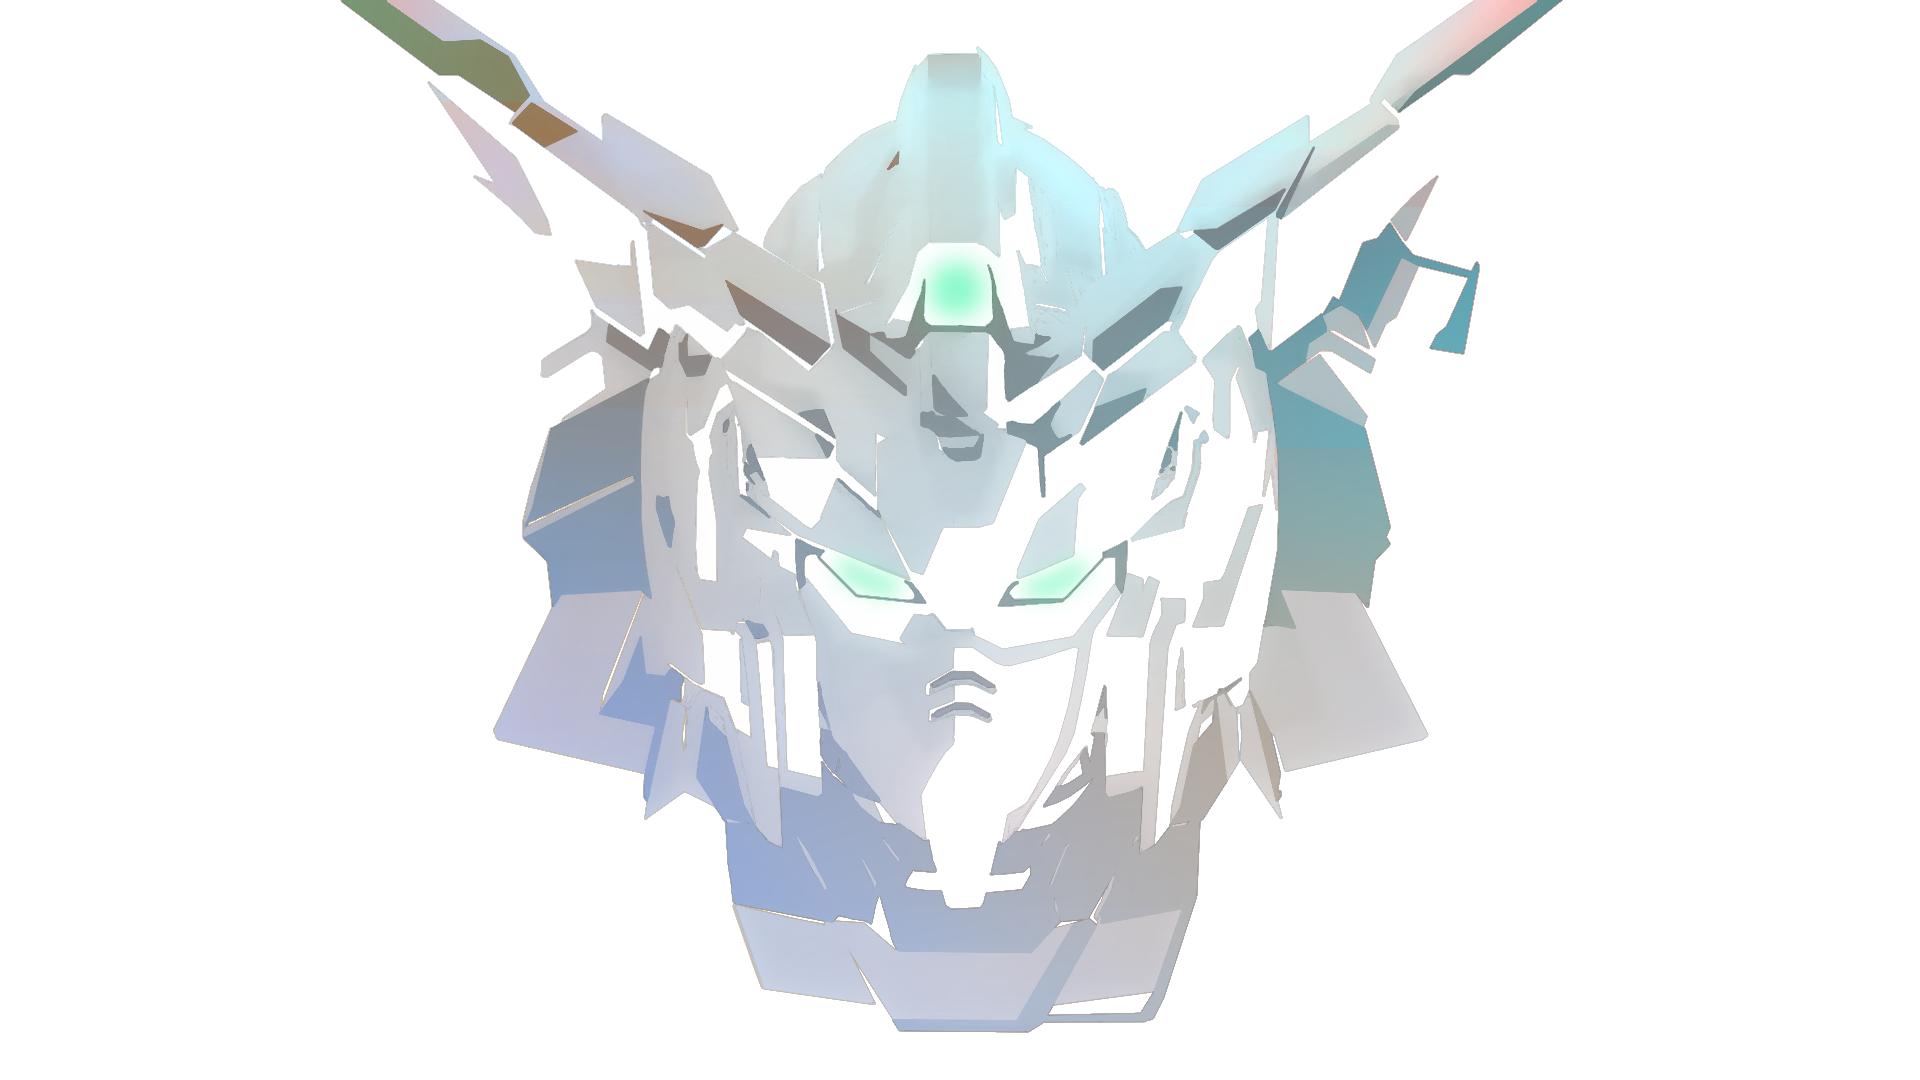 Hd Gundam Themes: [72+] Unicorn Gundam Wallpaper On WallpaperSafari